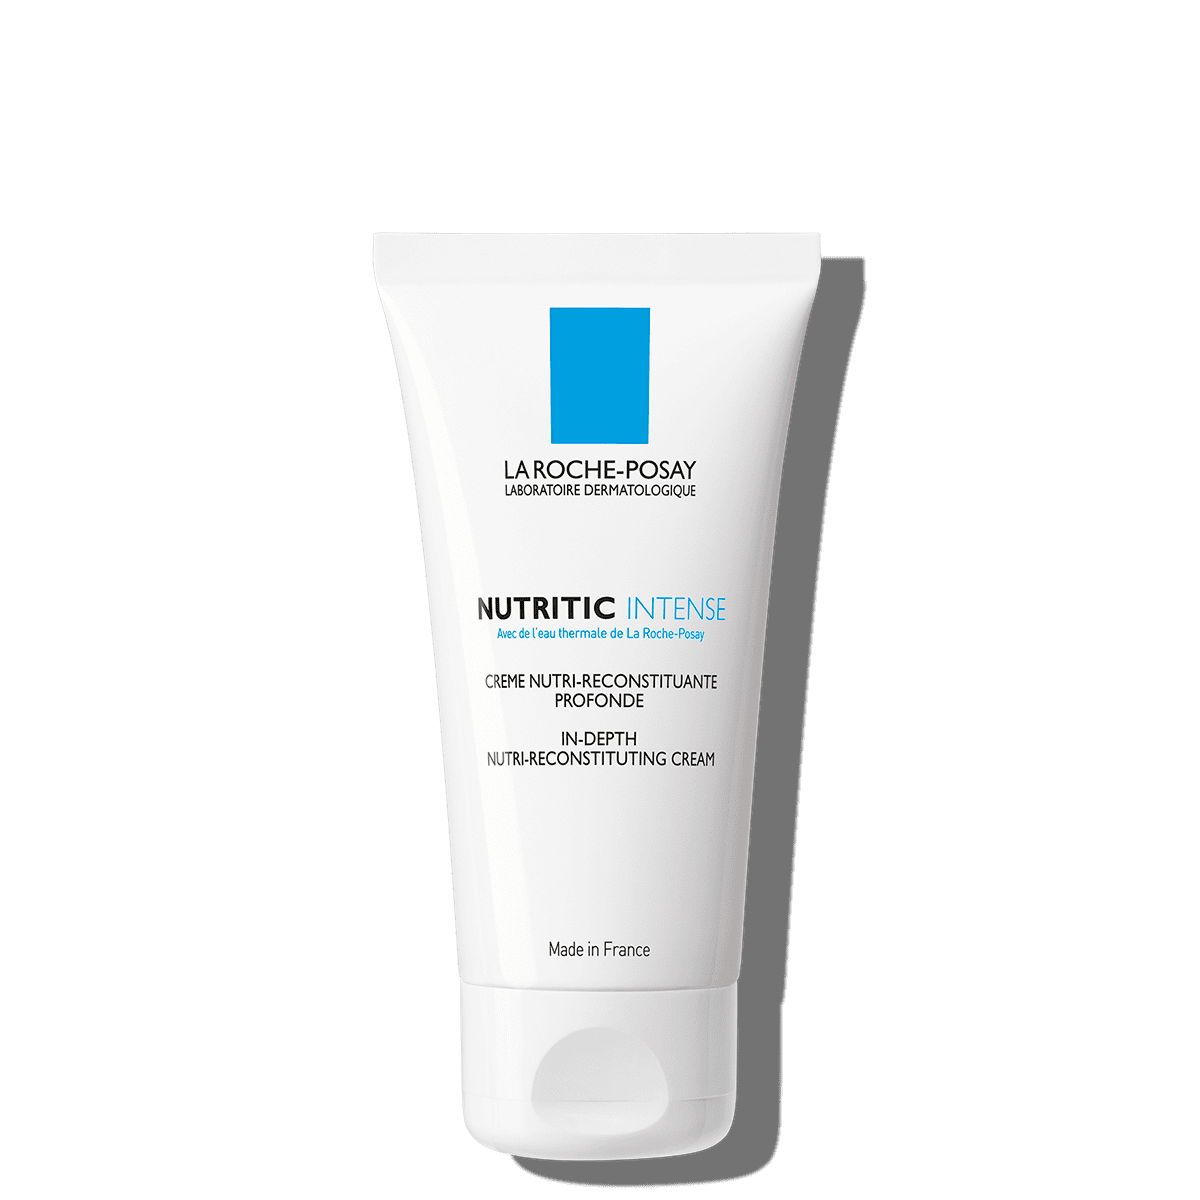 La Roche Posay ProduktSide Ansigtspleje Nærende Intens Creme 50ml 33378